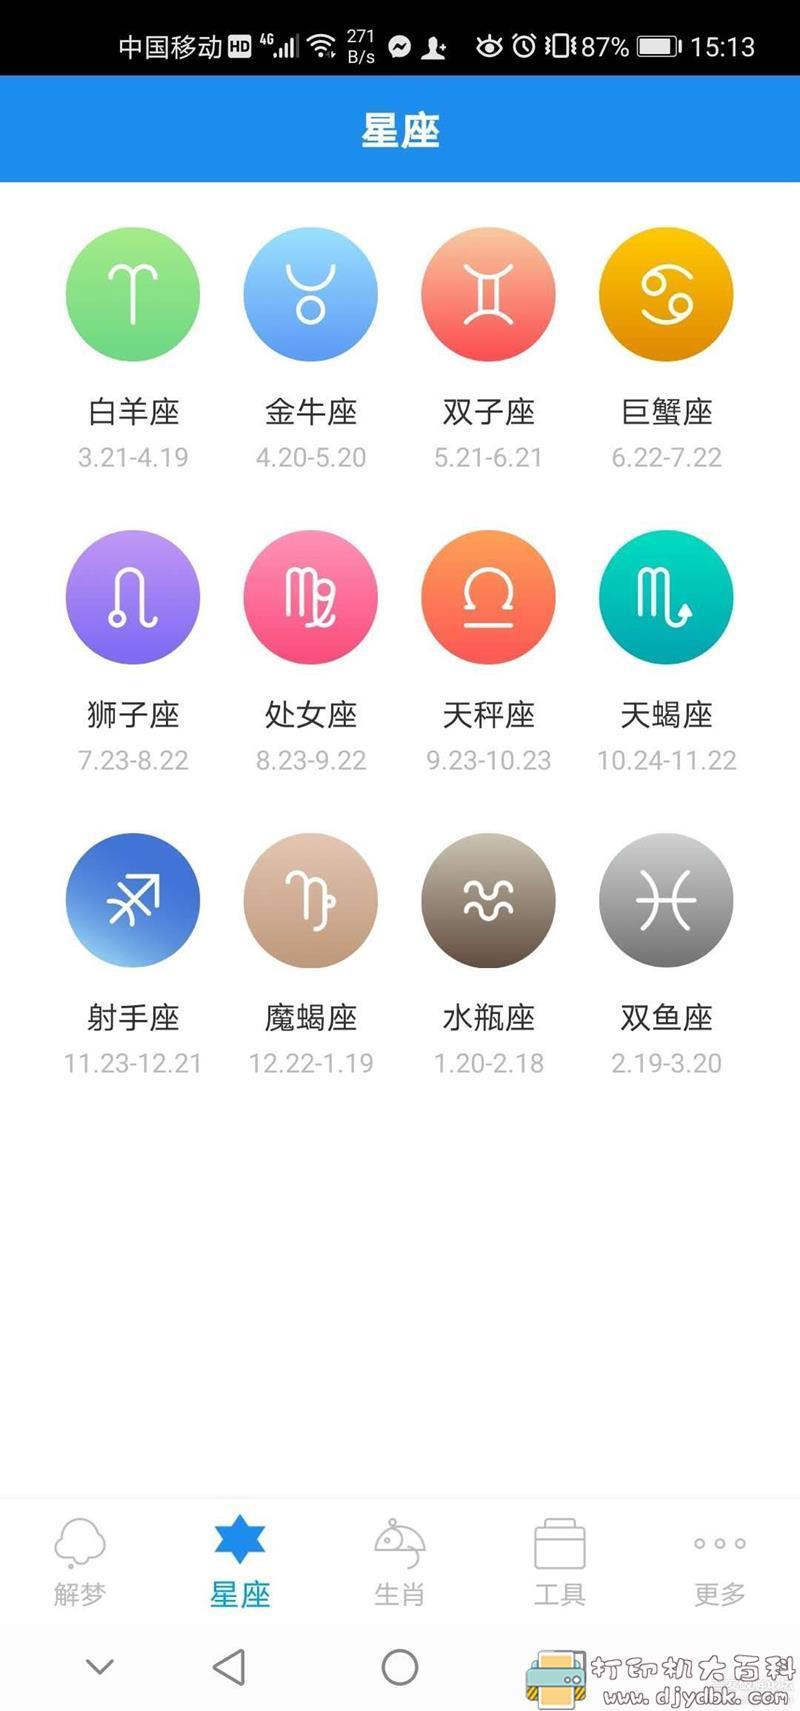 [Android]【周公解梦app】解梦预测图片 No.7